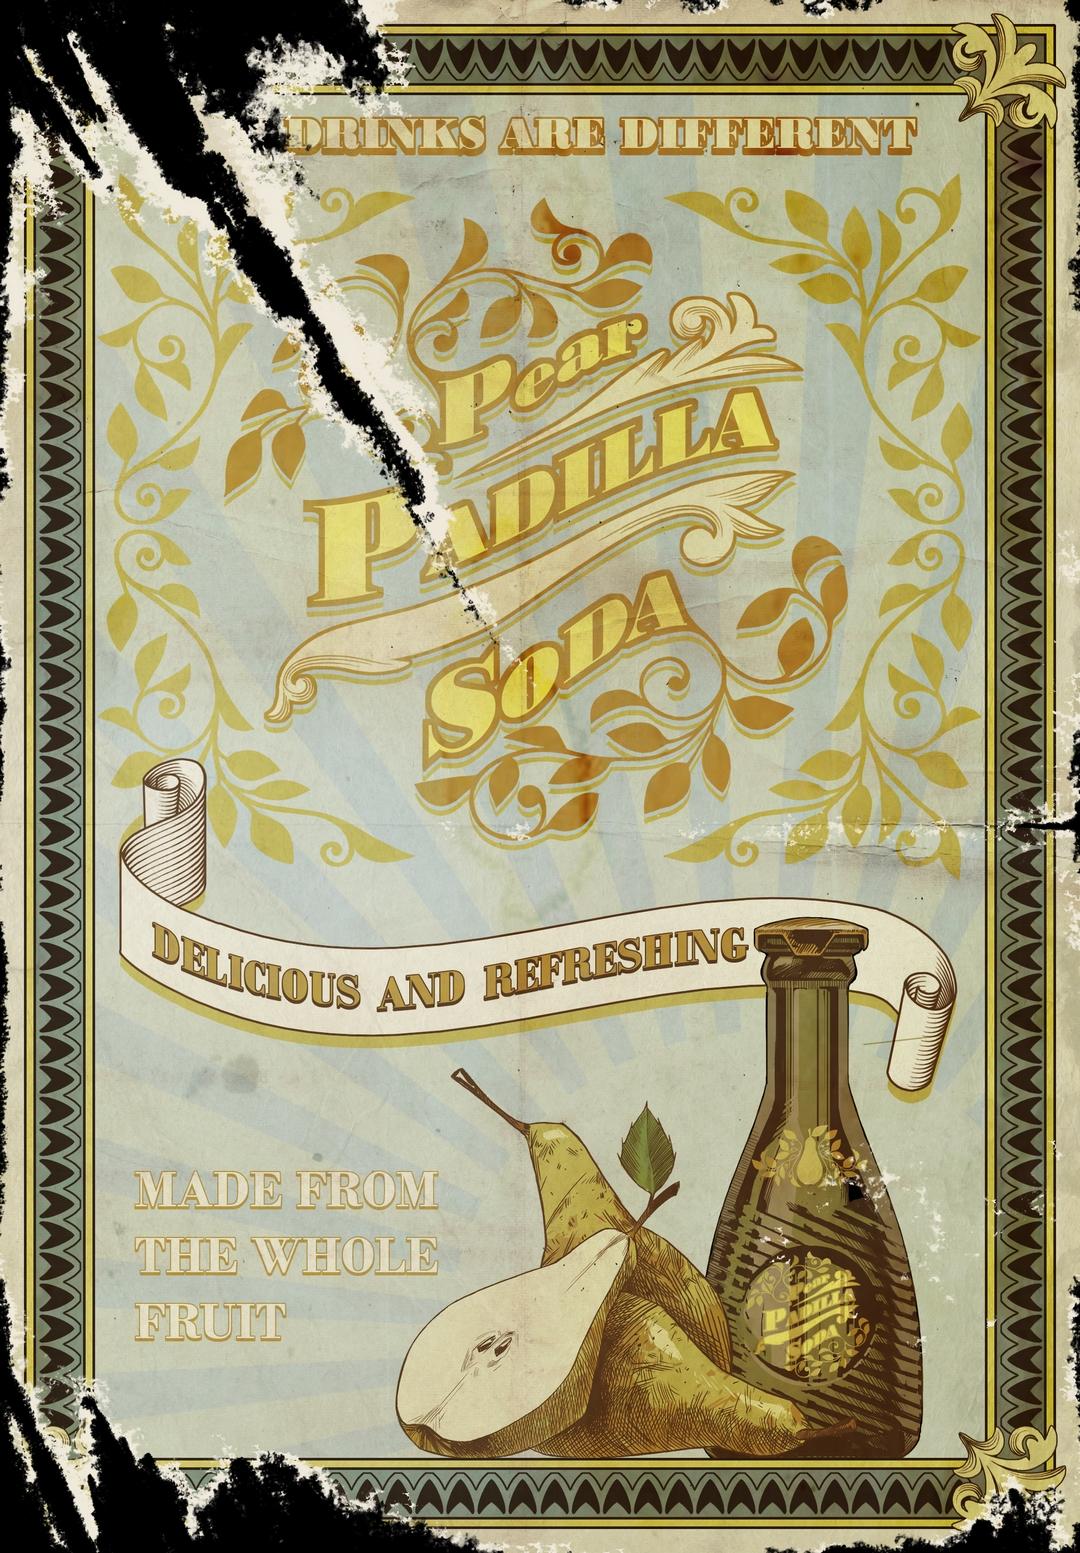 pear-padilla-soda-poster-dishonored-2-artwork